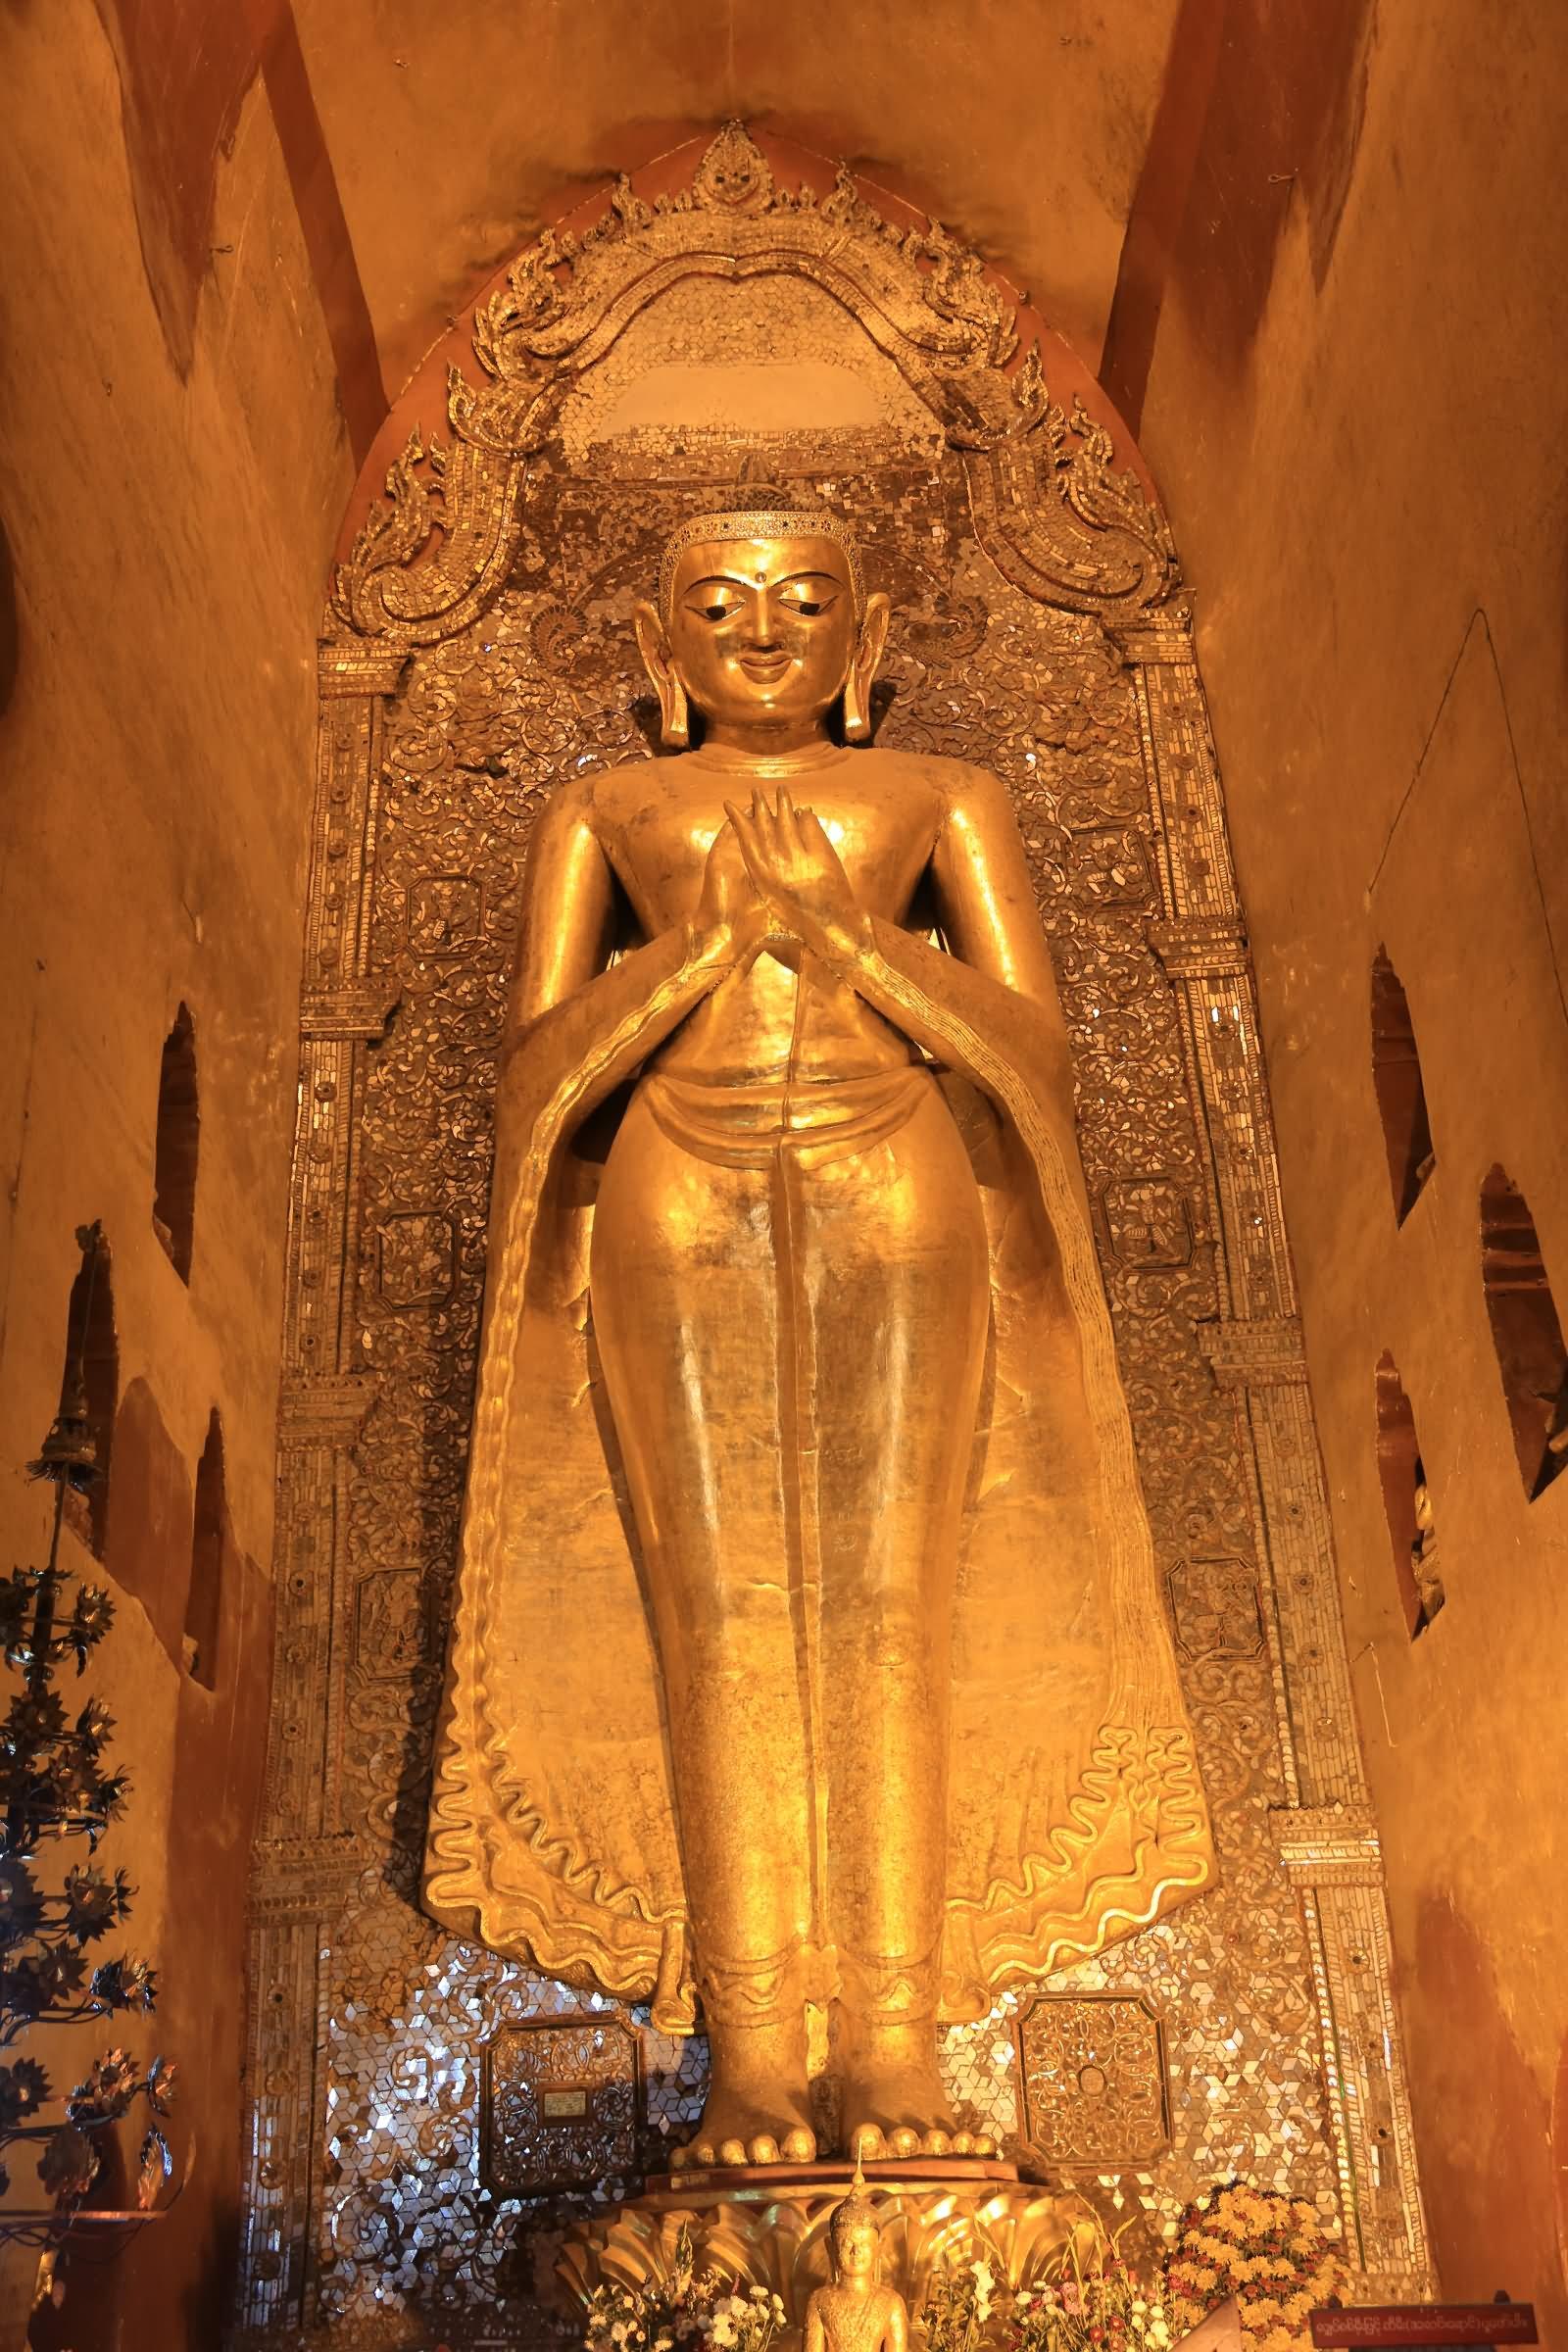 Beautiful Golden Lord Buddha Statue Inside The Ananda Temple